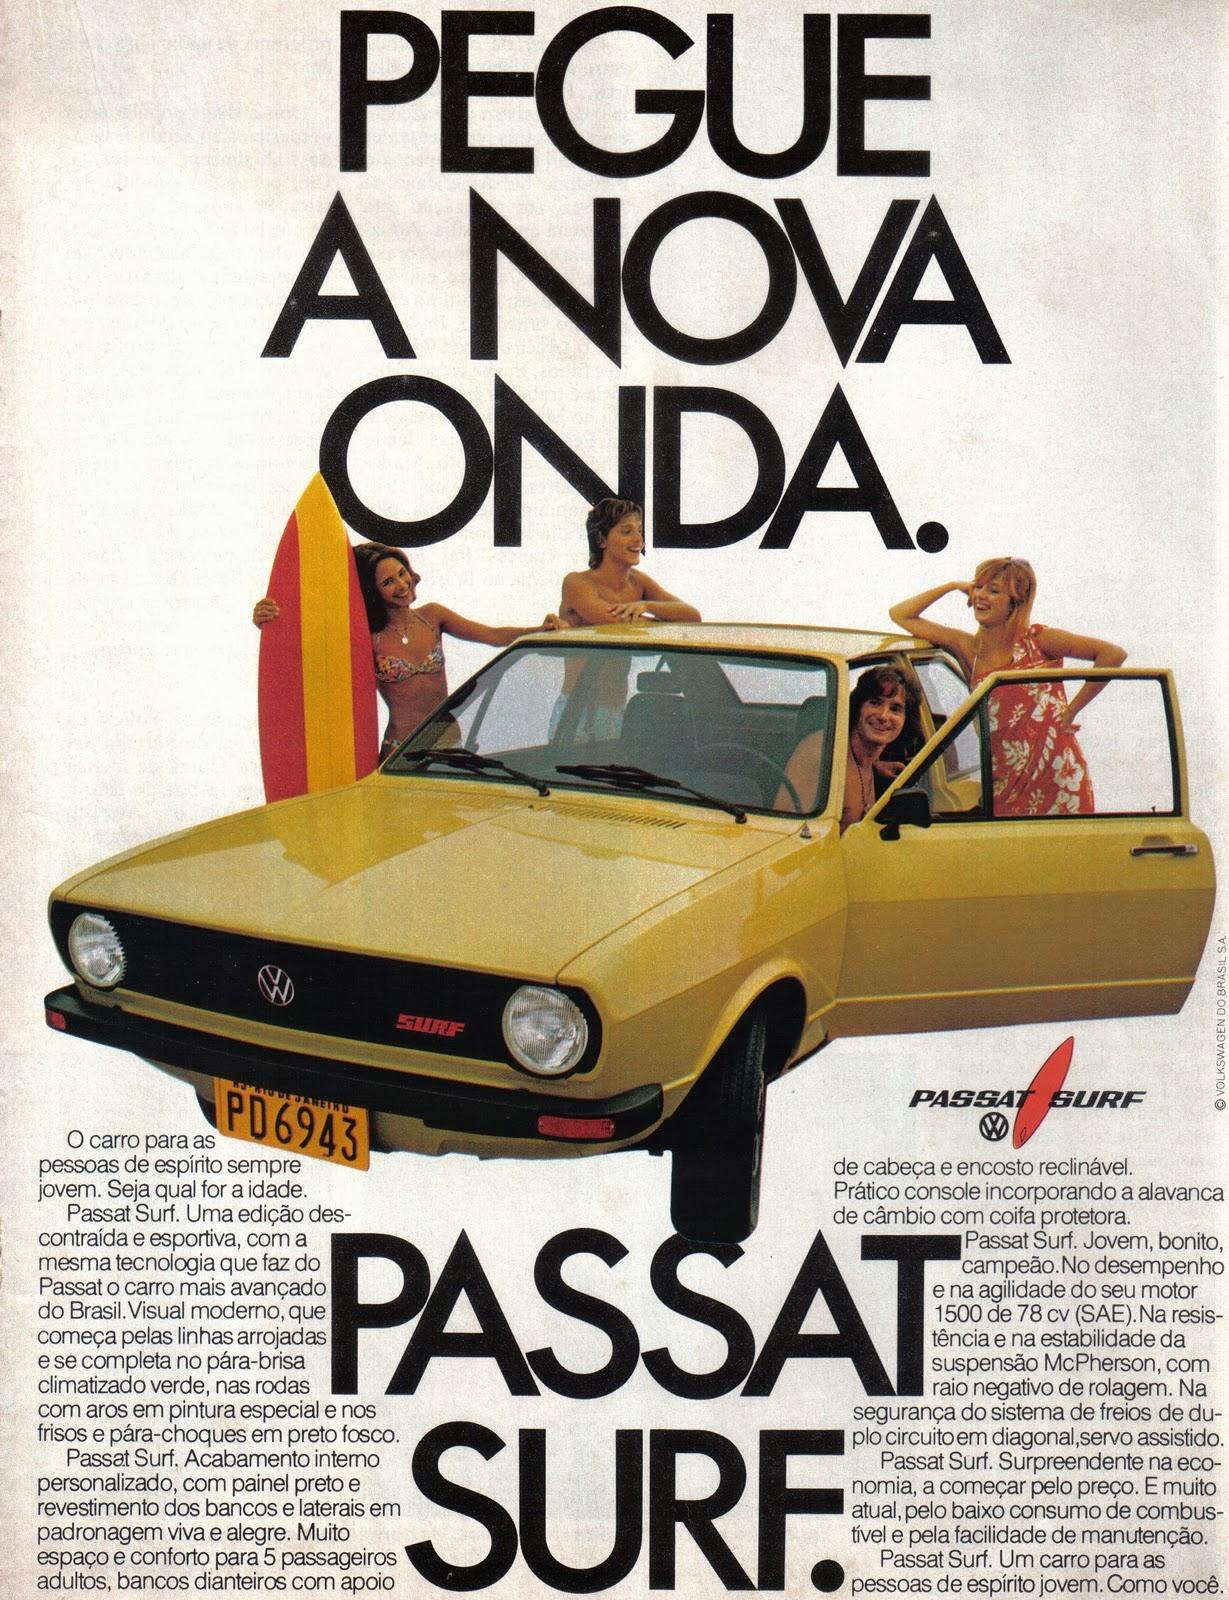 Propaganda do Passat Surf da Volkswagen - 1978.